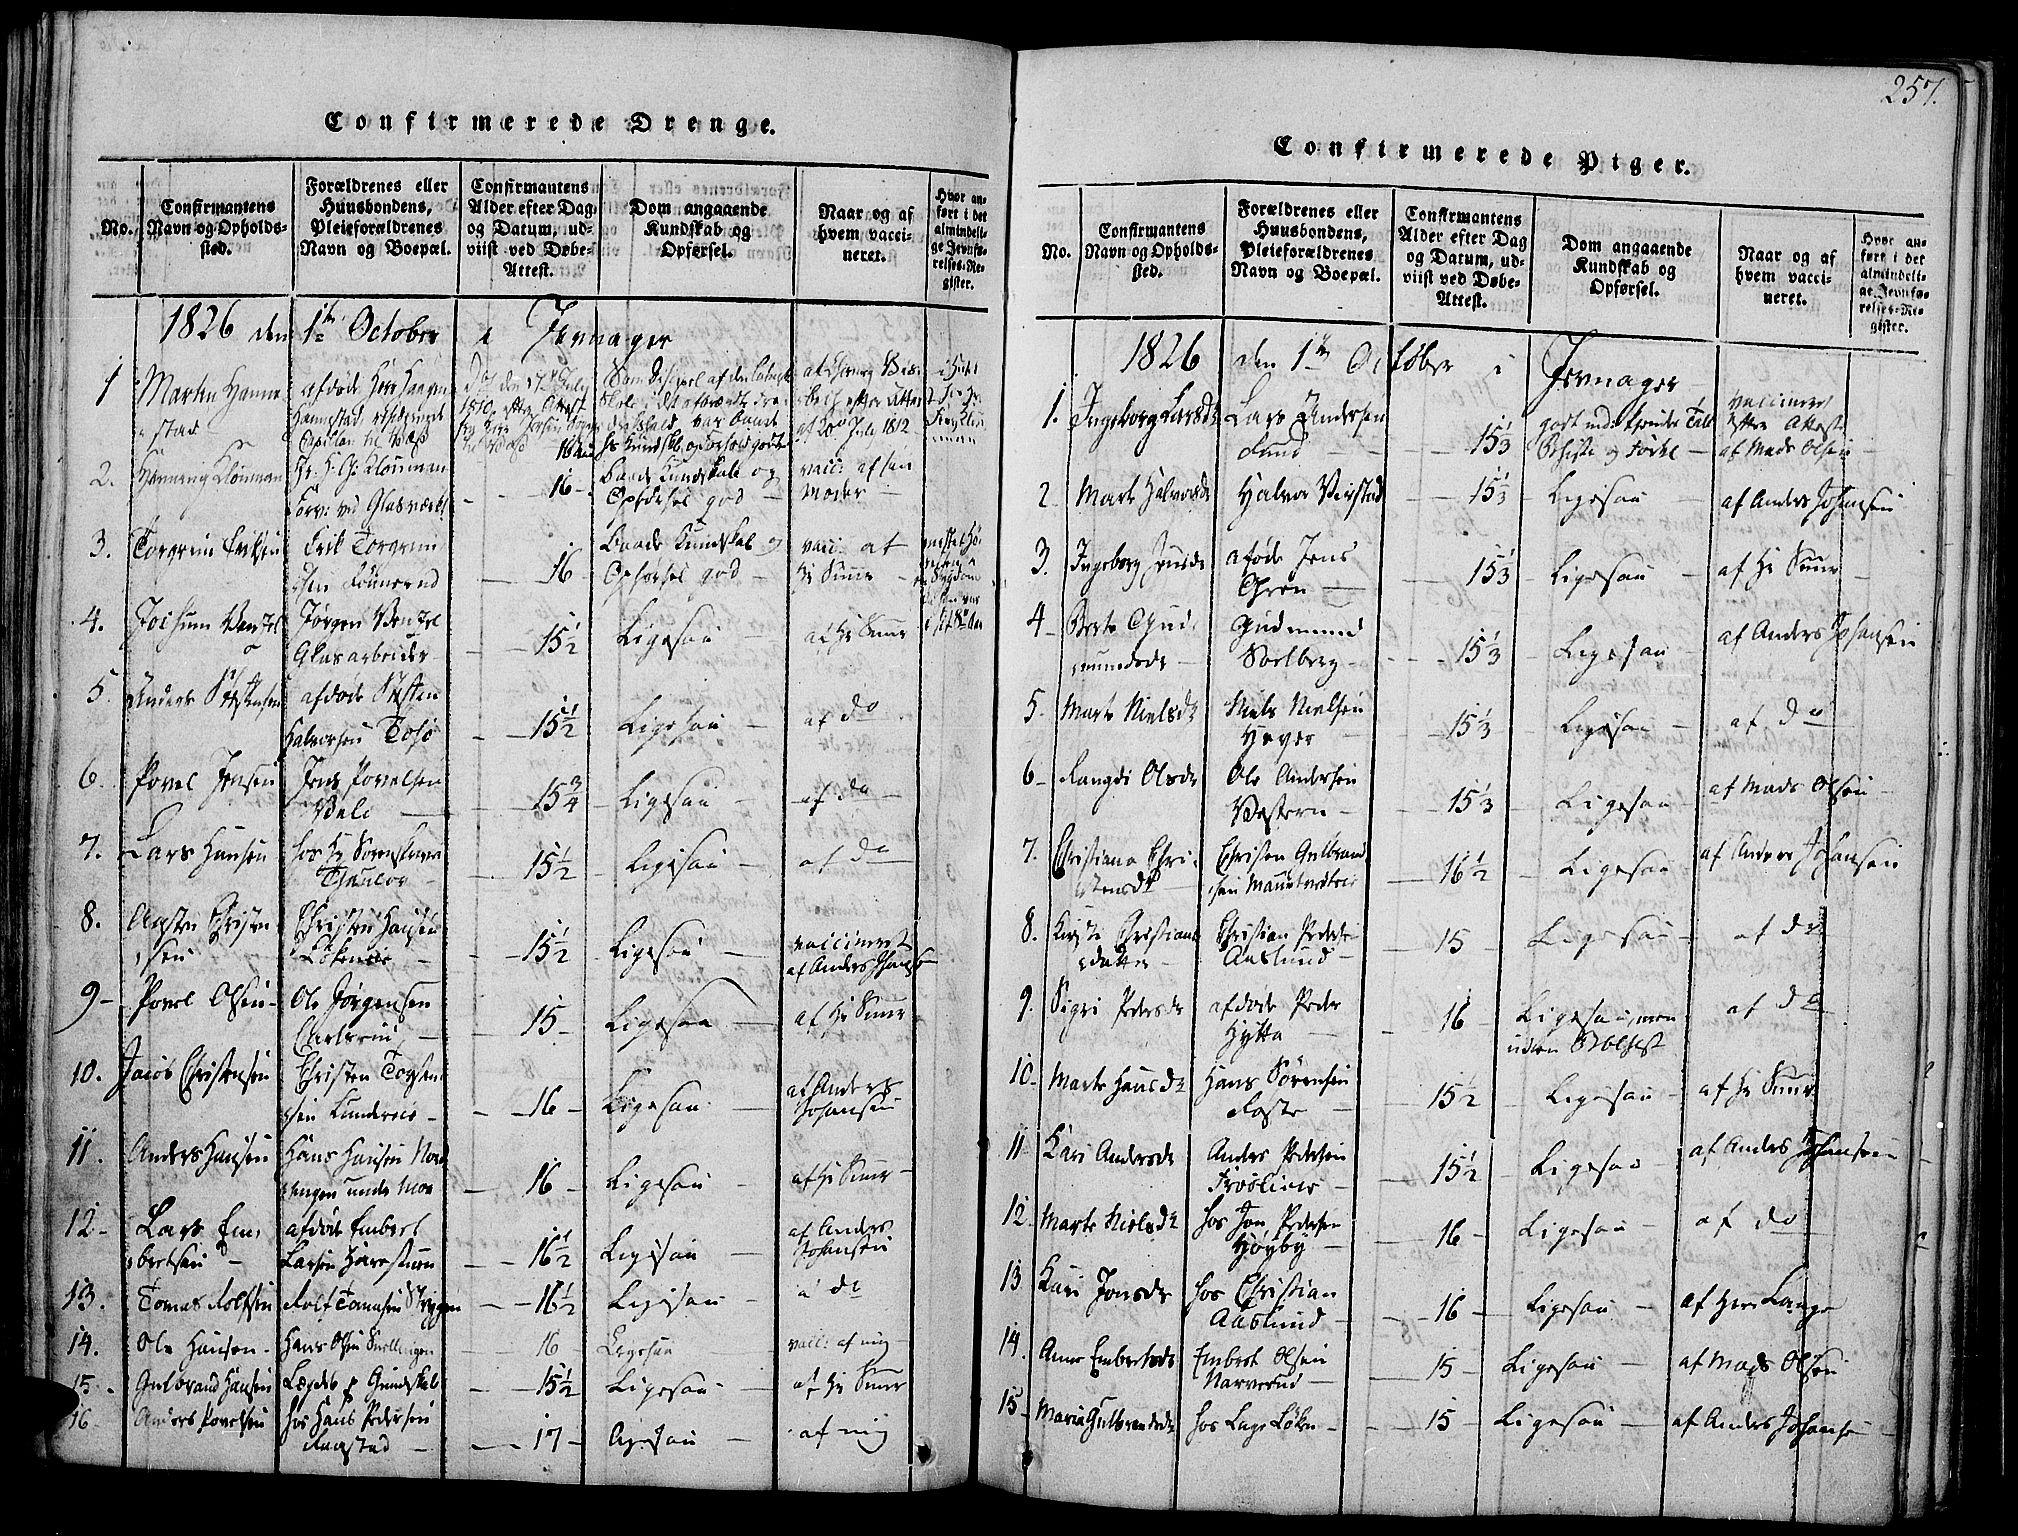 SAH, Jevnaker prestekontor, Ministerialbok nr. 5, 1815-1837, s. 257